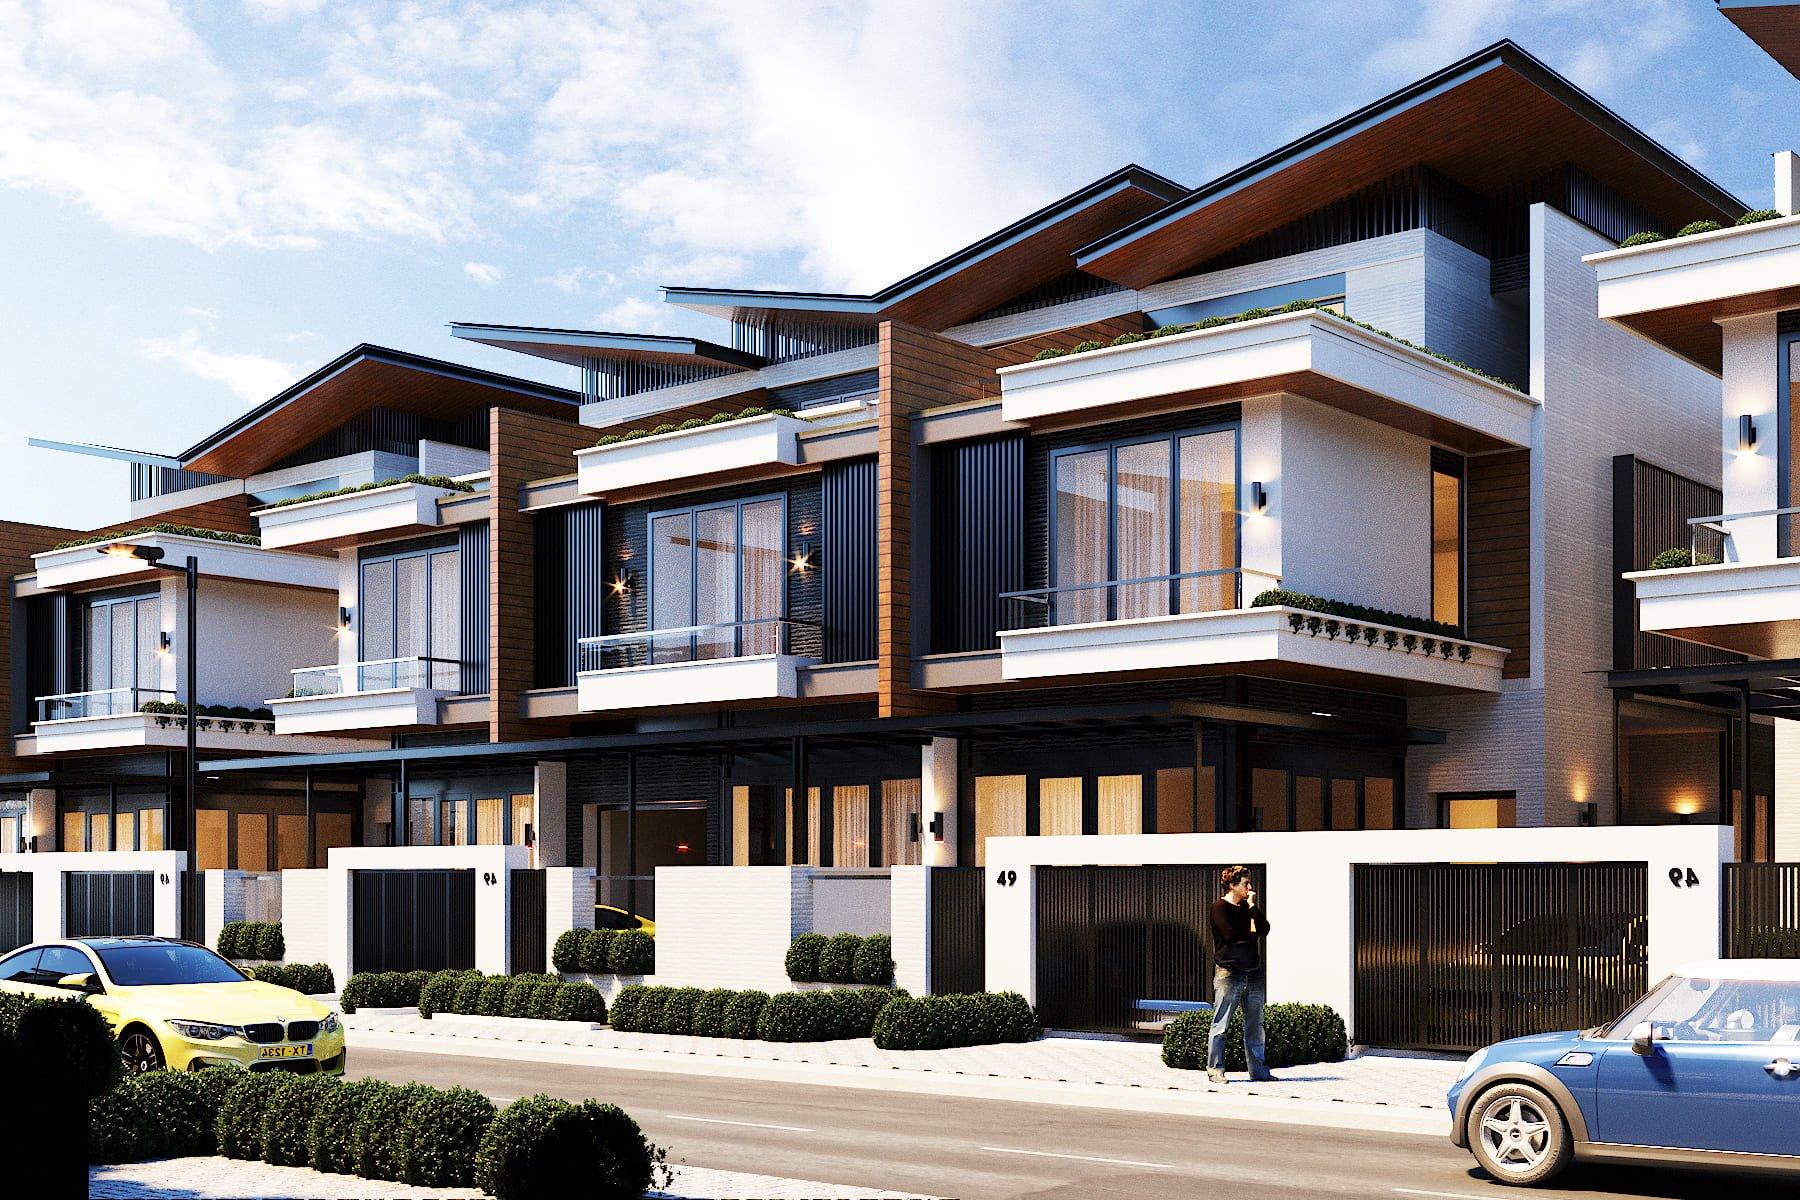 41 interactive Danang IT Park - Industrial Real Estate